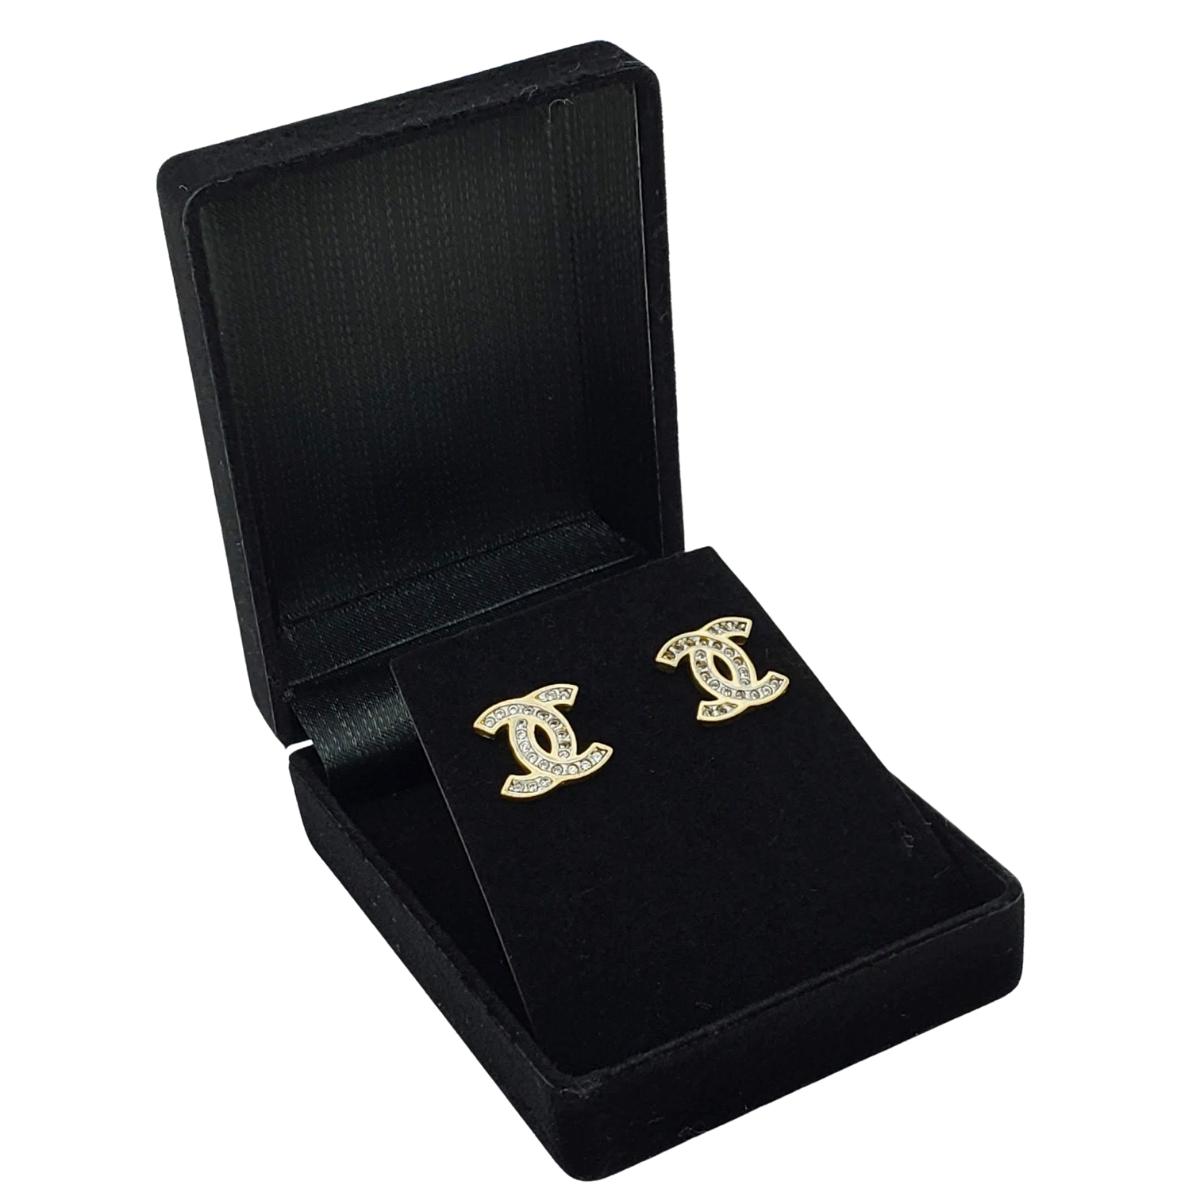 Brincos Cravejados De Zirconias Banho De Ouro 18k 2280